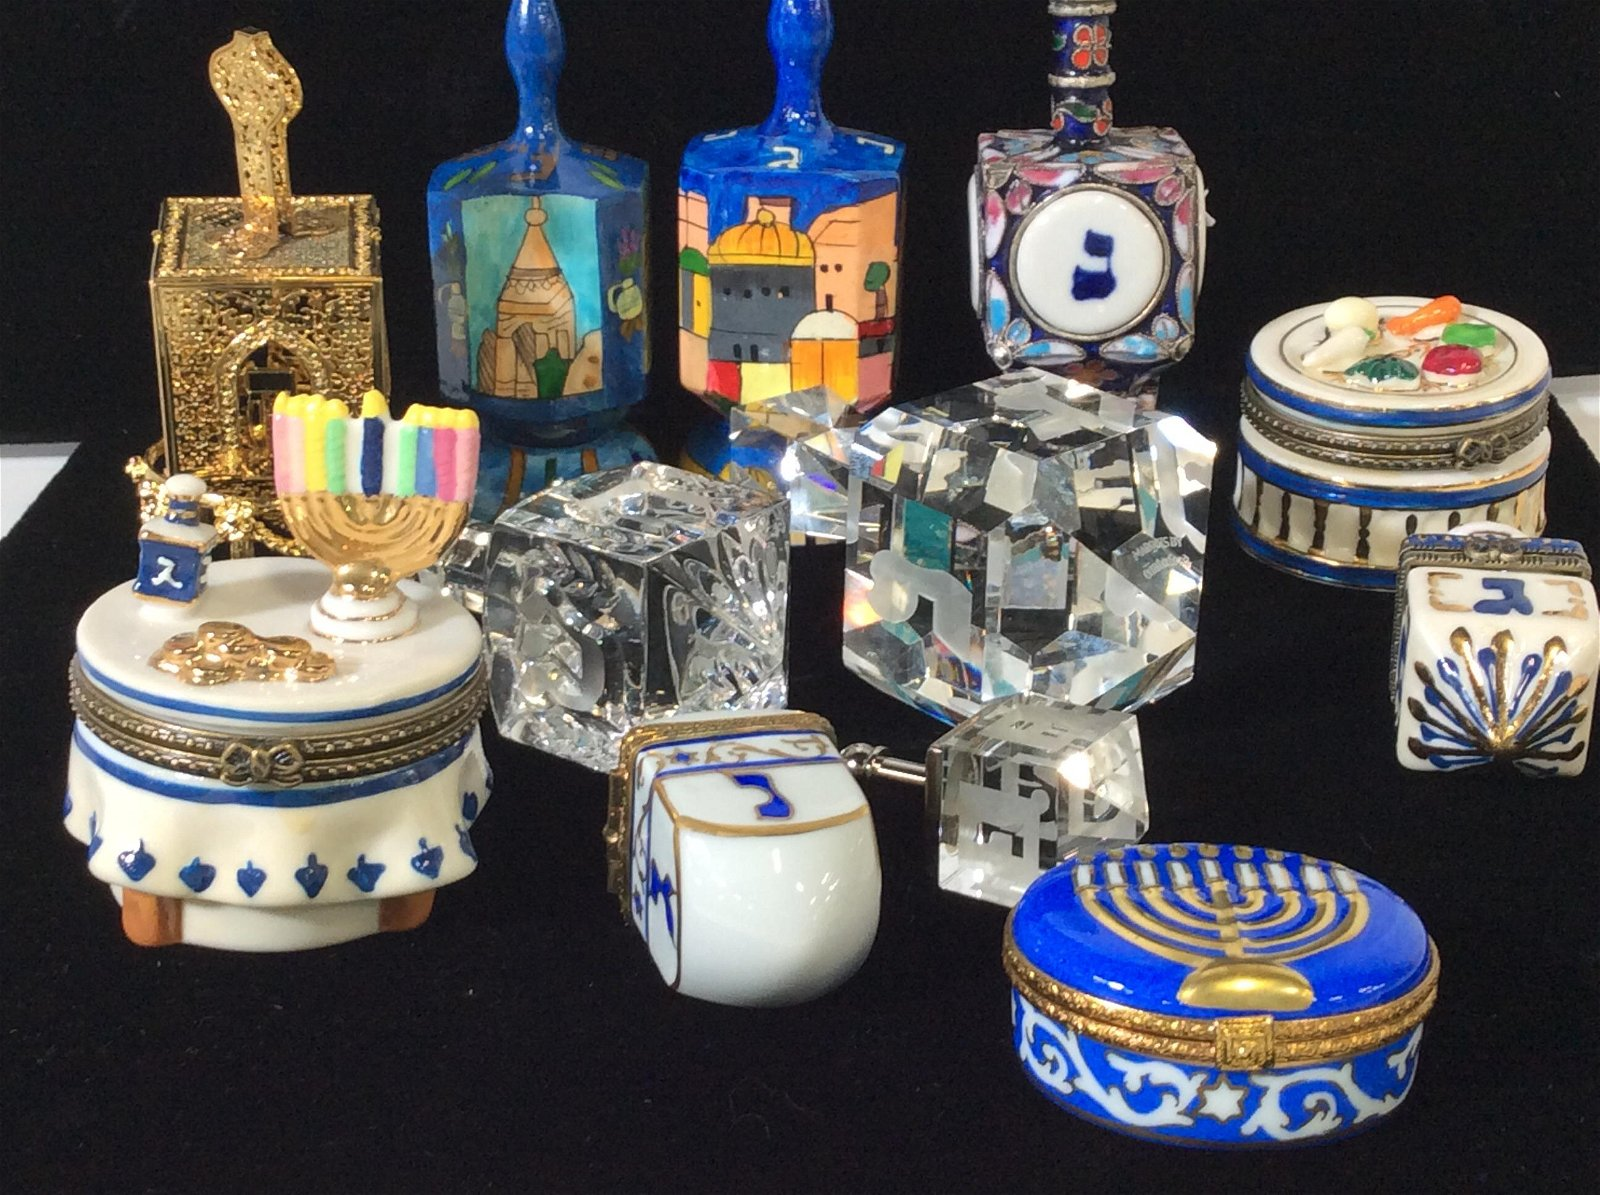 Huge Lot of Decorative Tabletop Judaica Access.